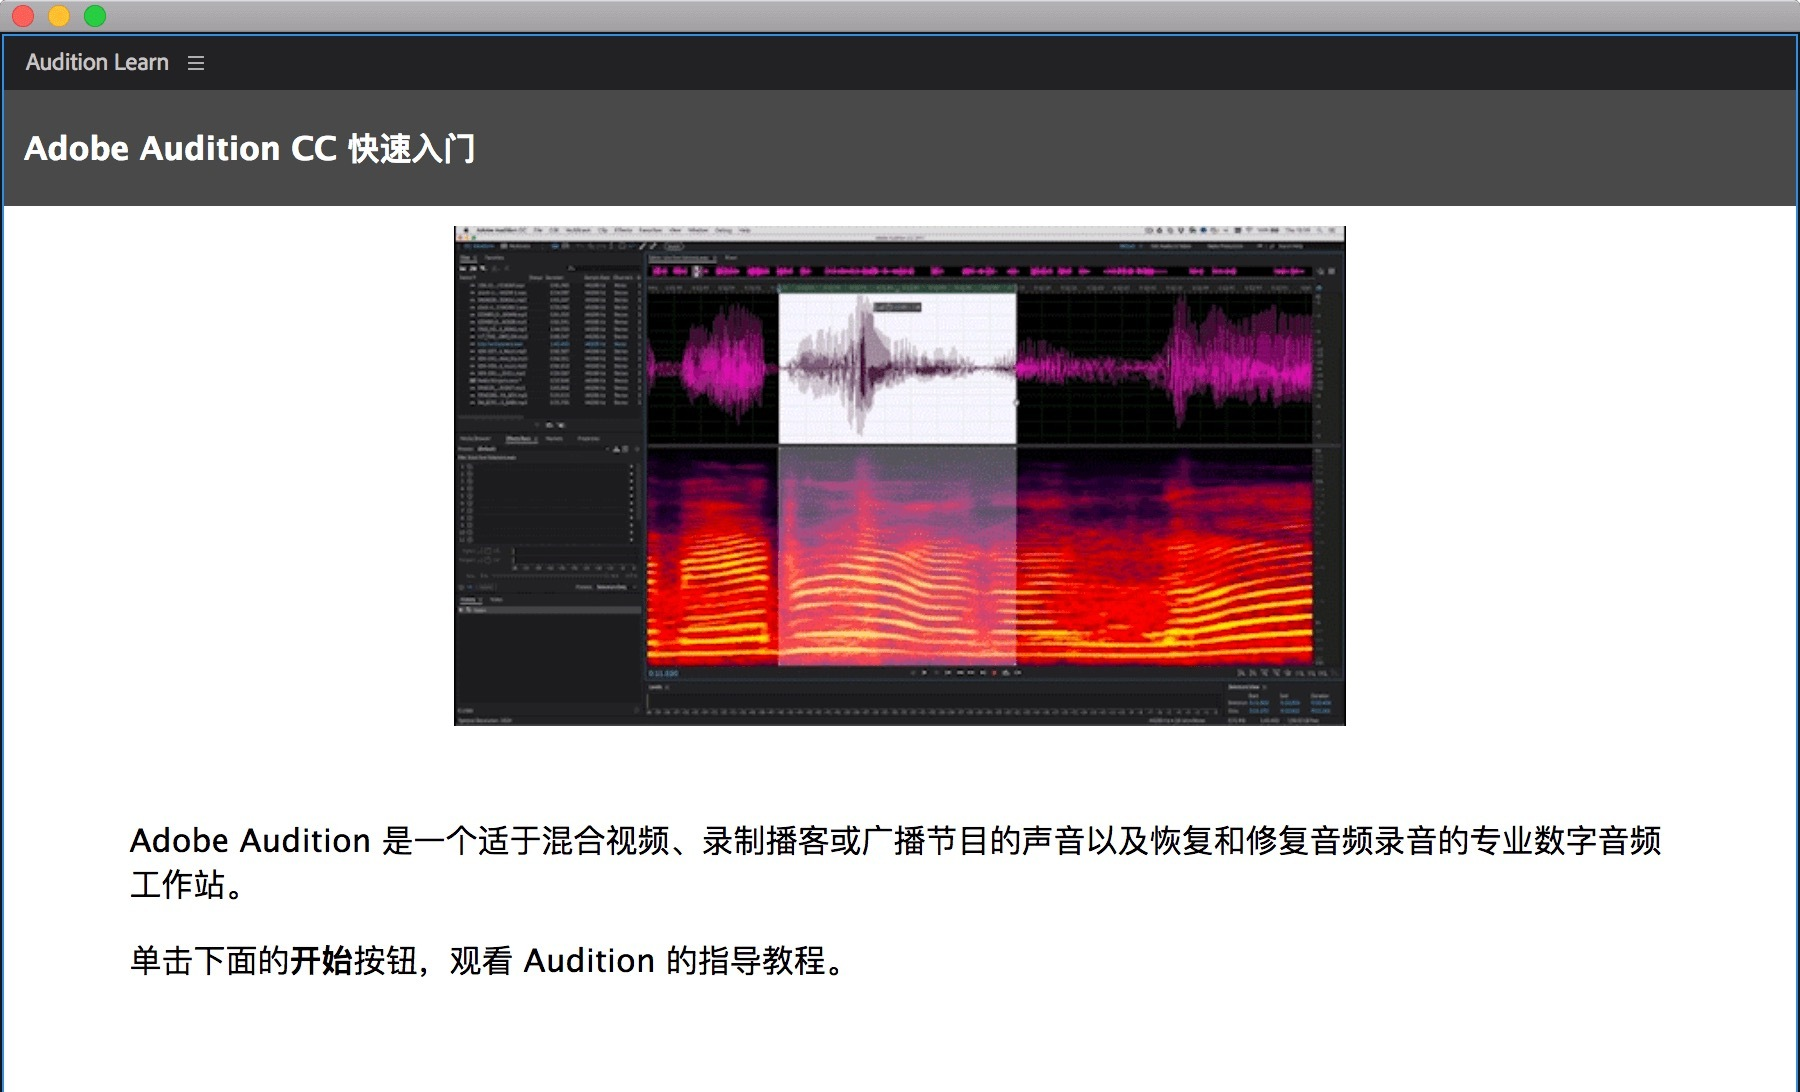 Adobe Audition 2020 v13.0.9 中文破解版 专业音频处理软件AU-马克喵